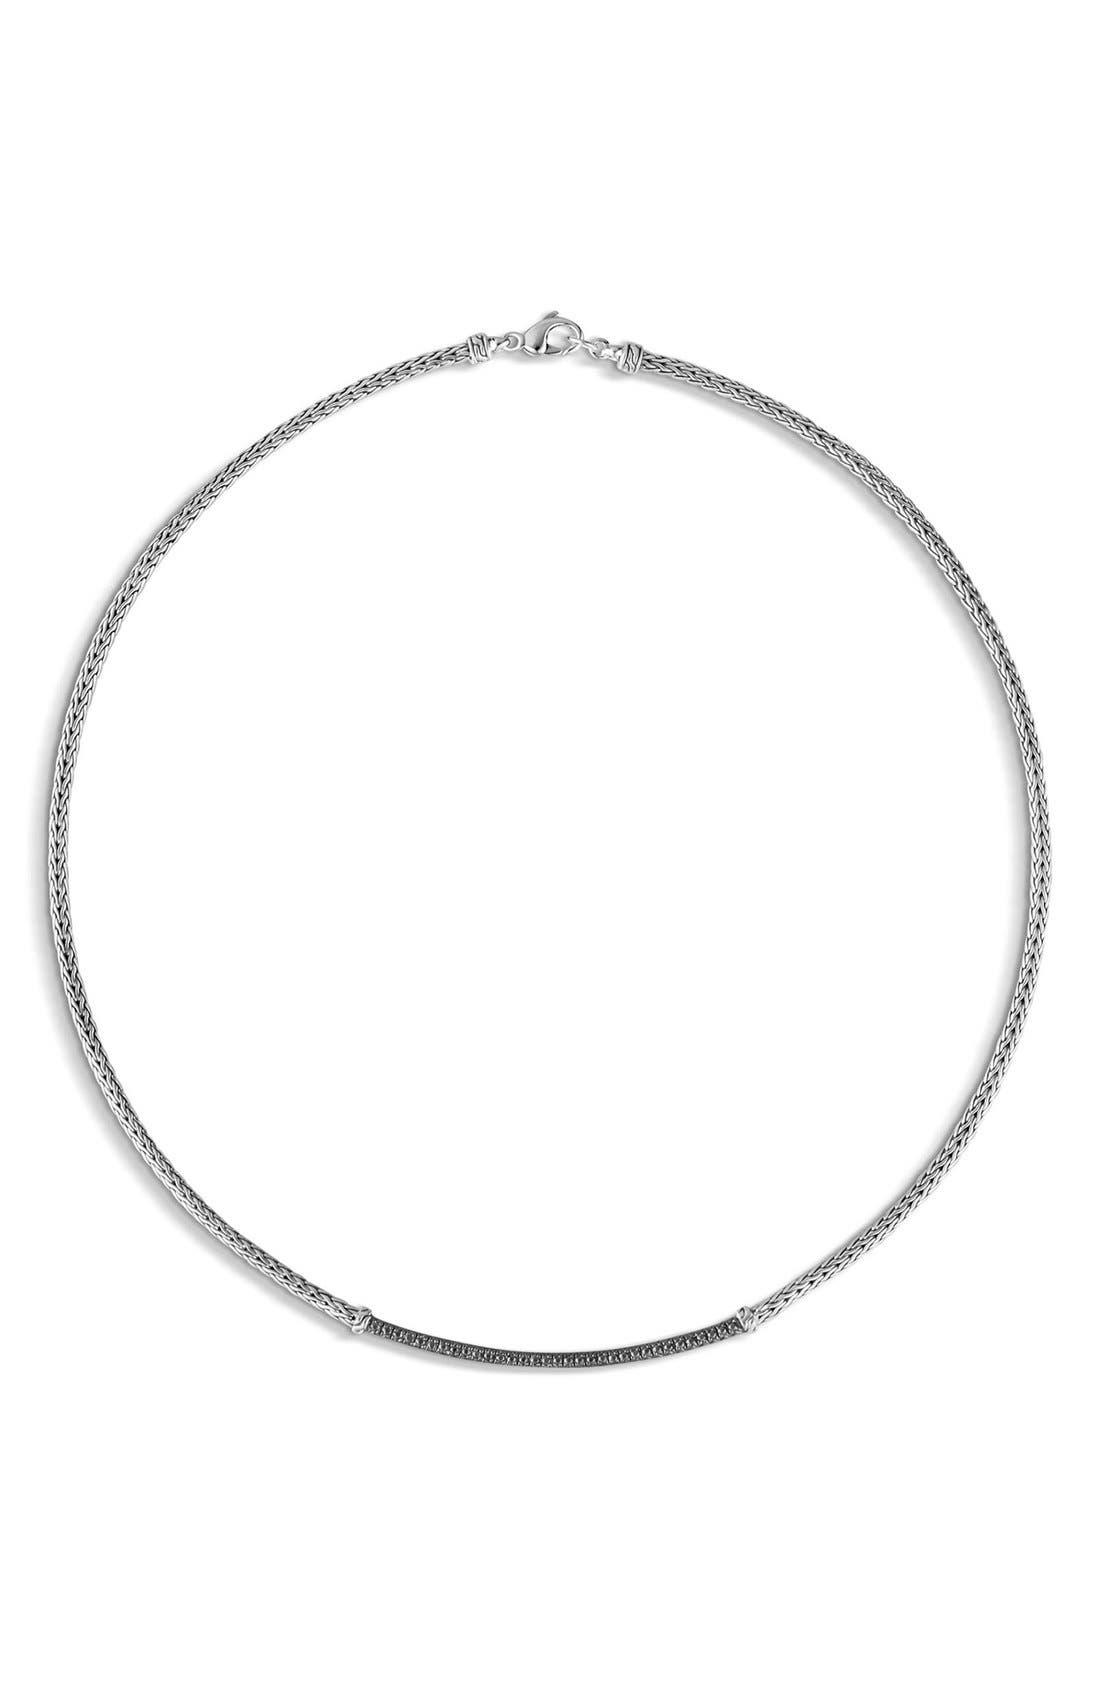 John Hardy 'Classic Chain' Collar Necklace